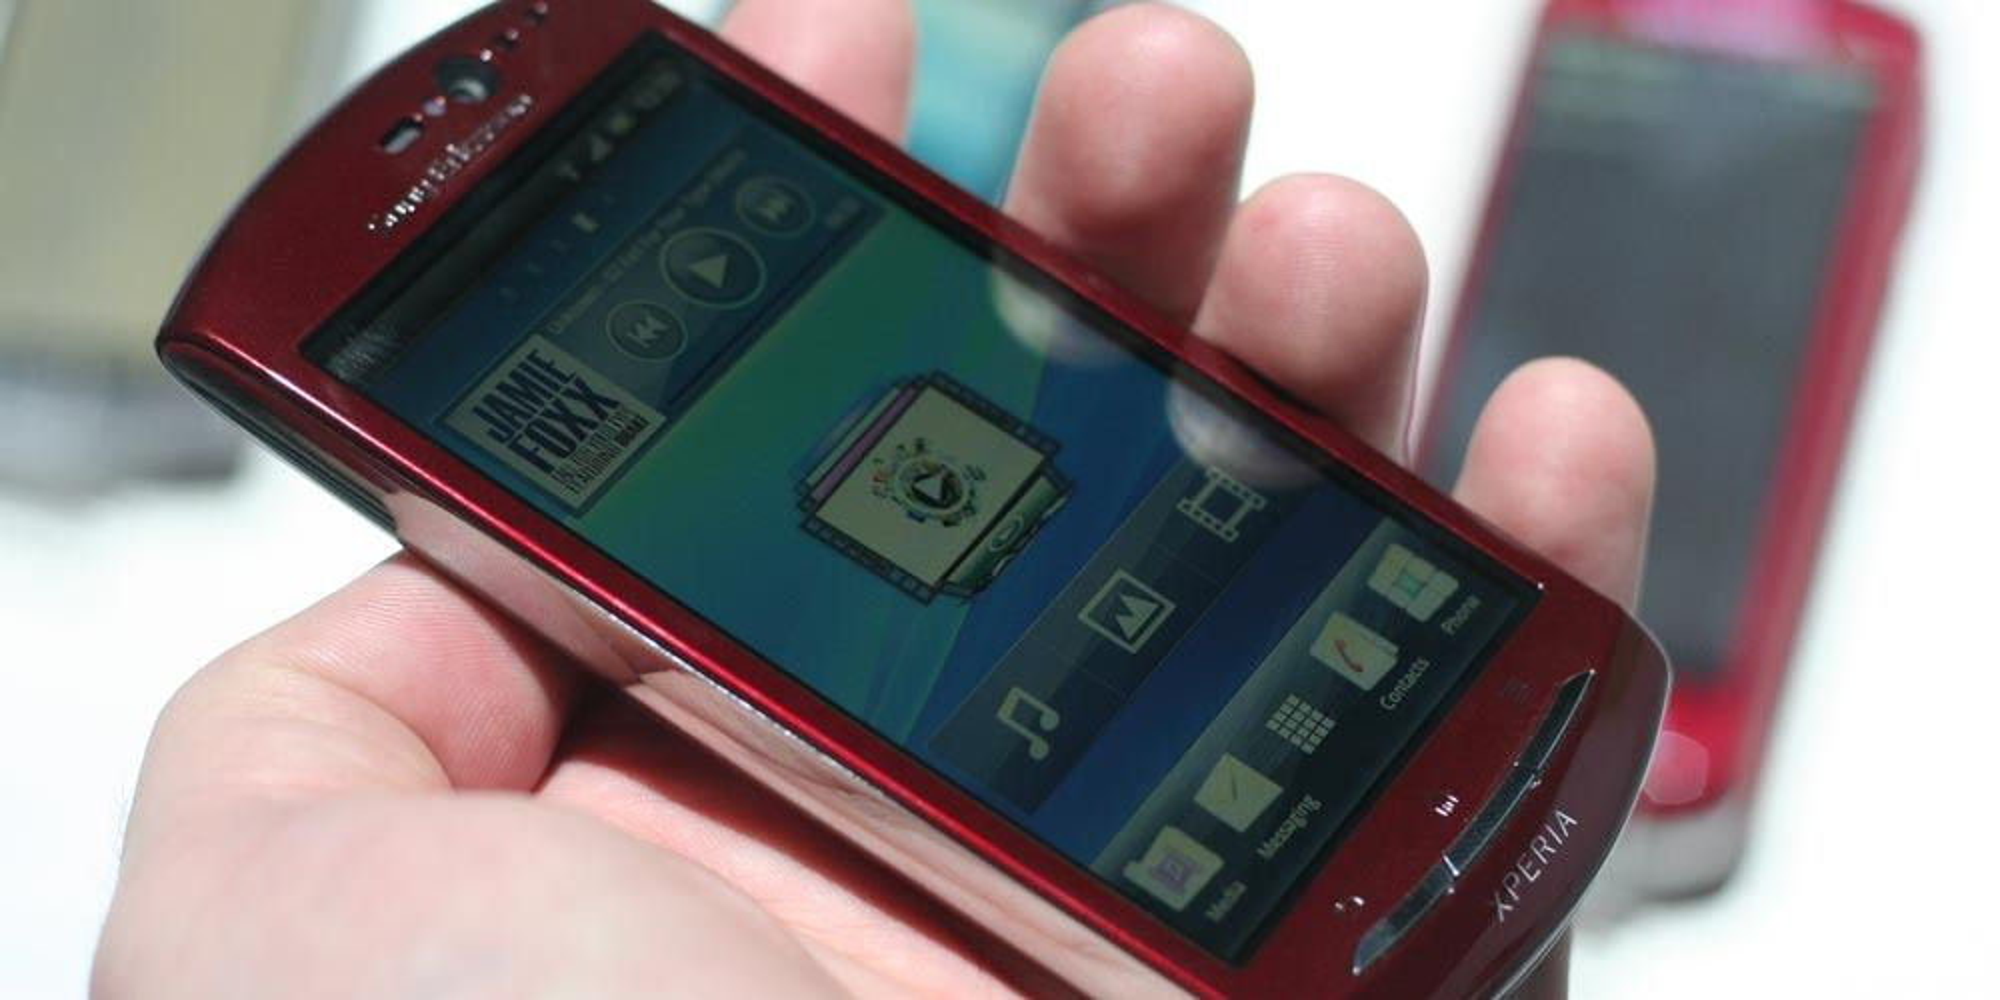 Sony Ericsson Xperia Neo er forsinket